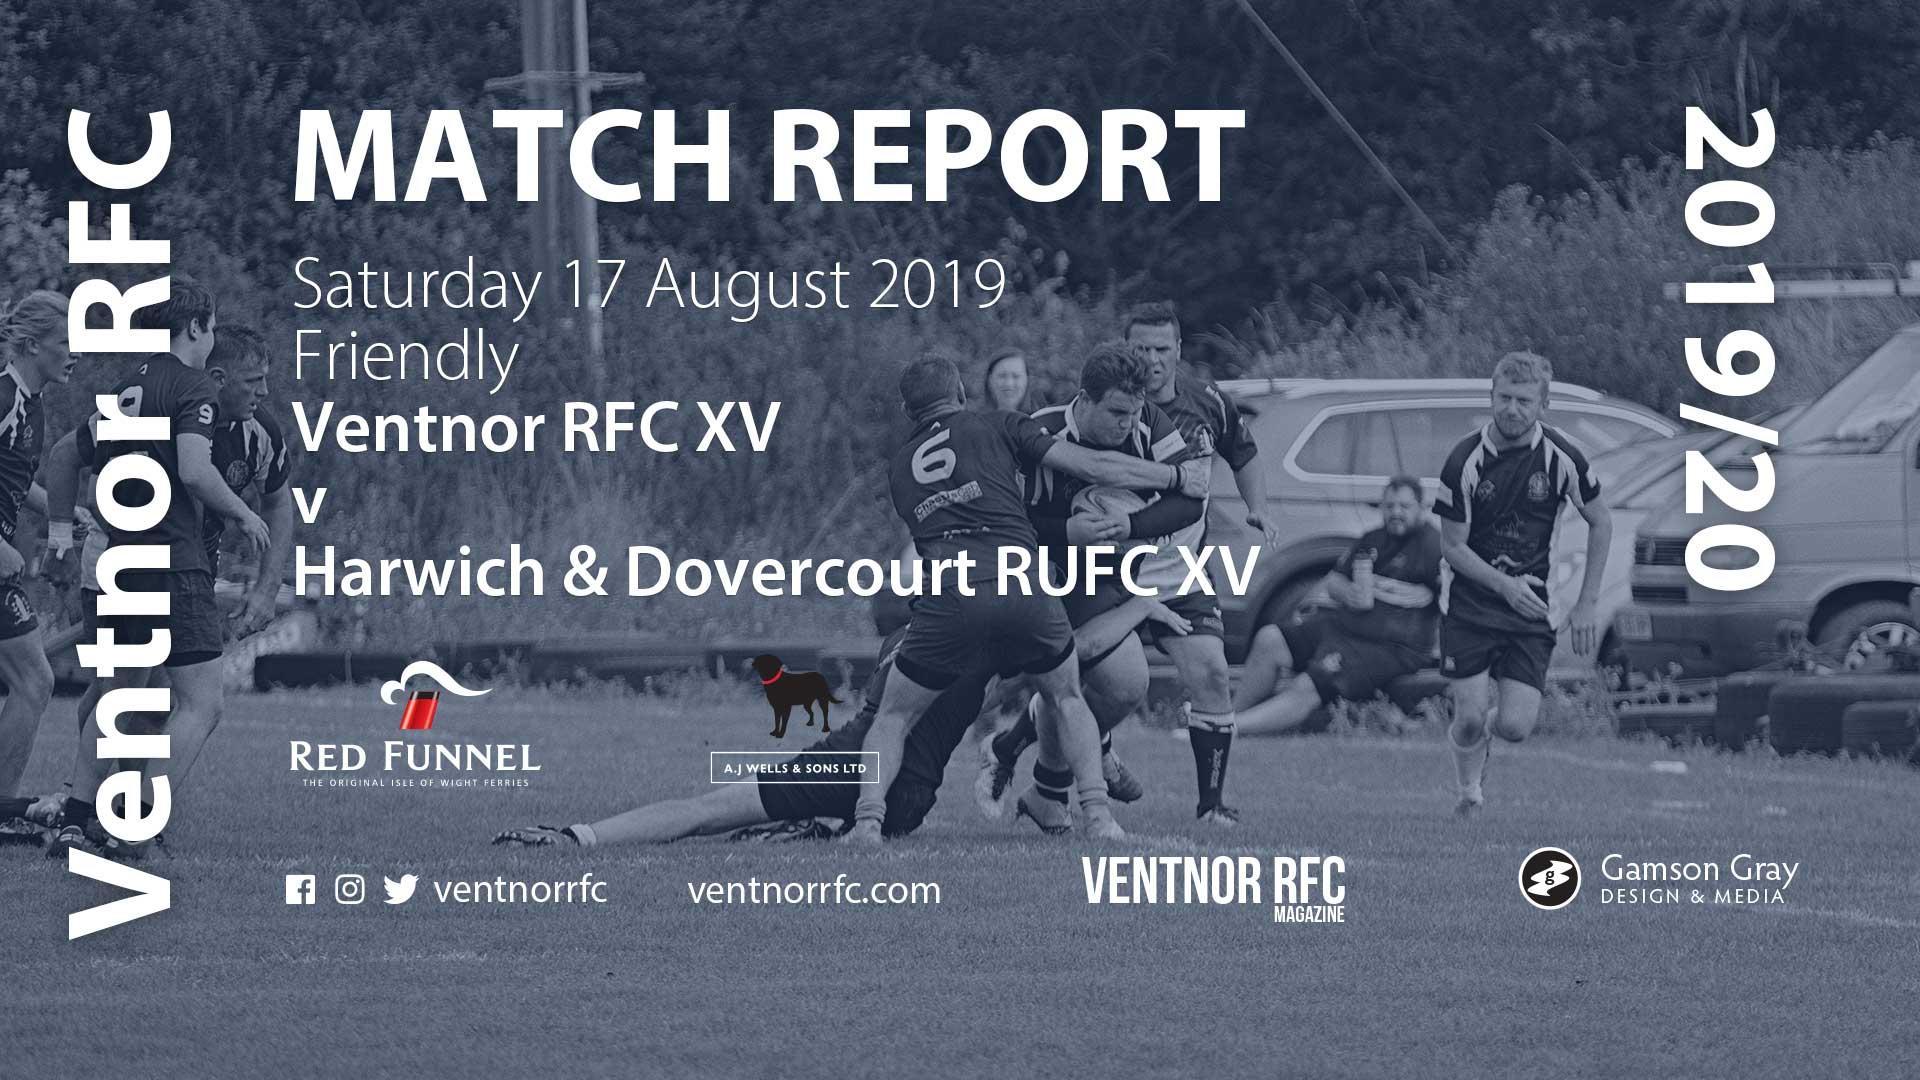 Ventnor RFC XV 54 – 10 Harwich and Dovercourt RUFC XV, 17 Aug 2019